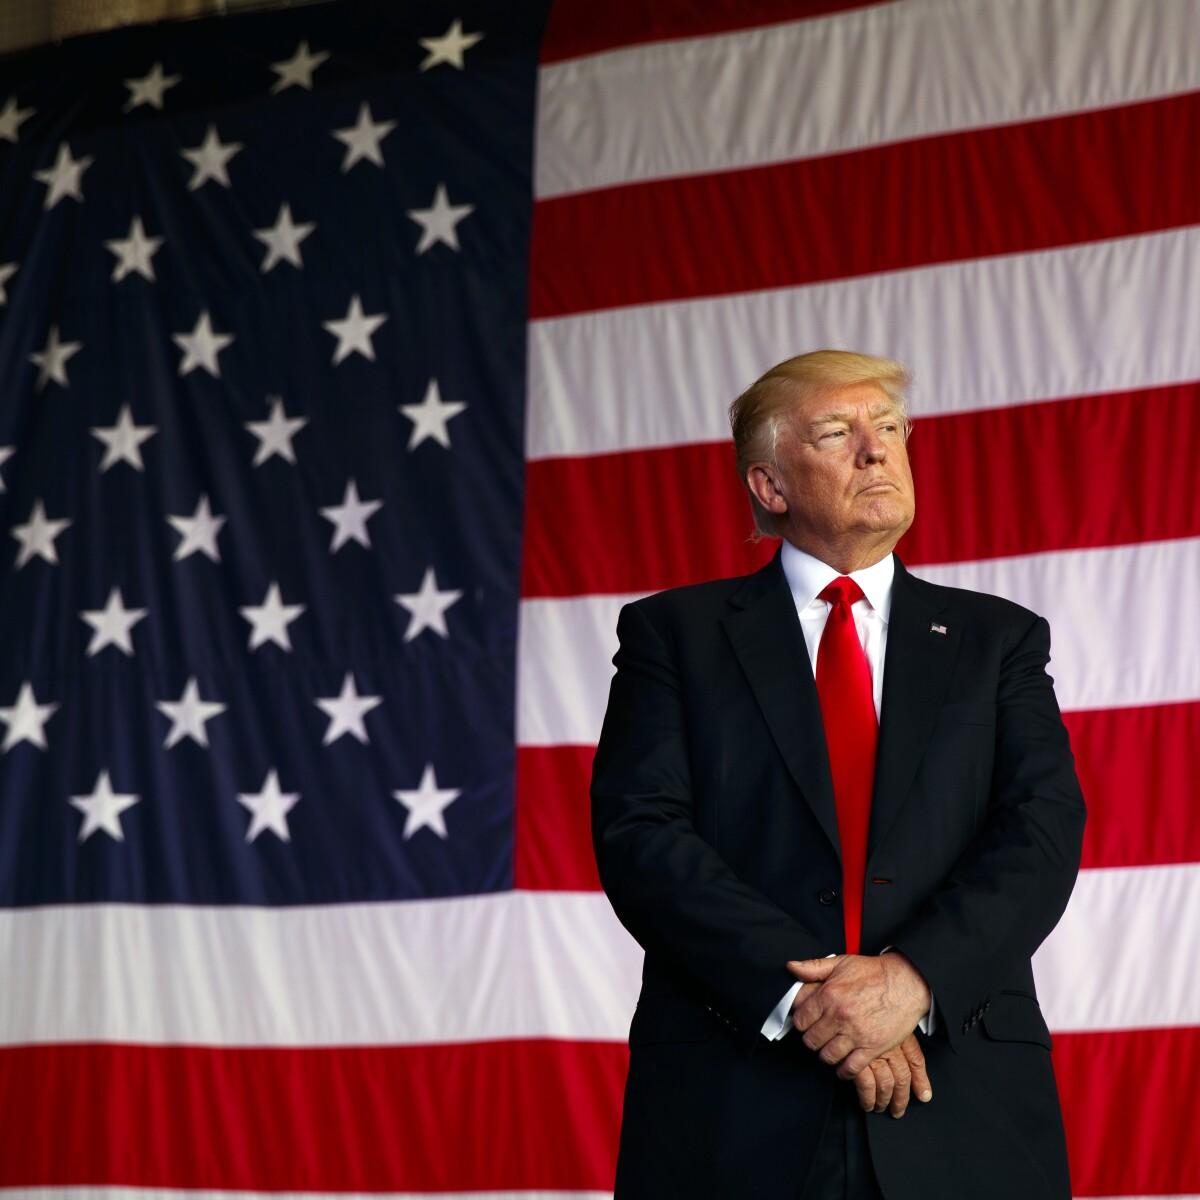 Trump caps first foreign trip: 'I think we hit a home run'